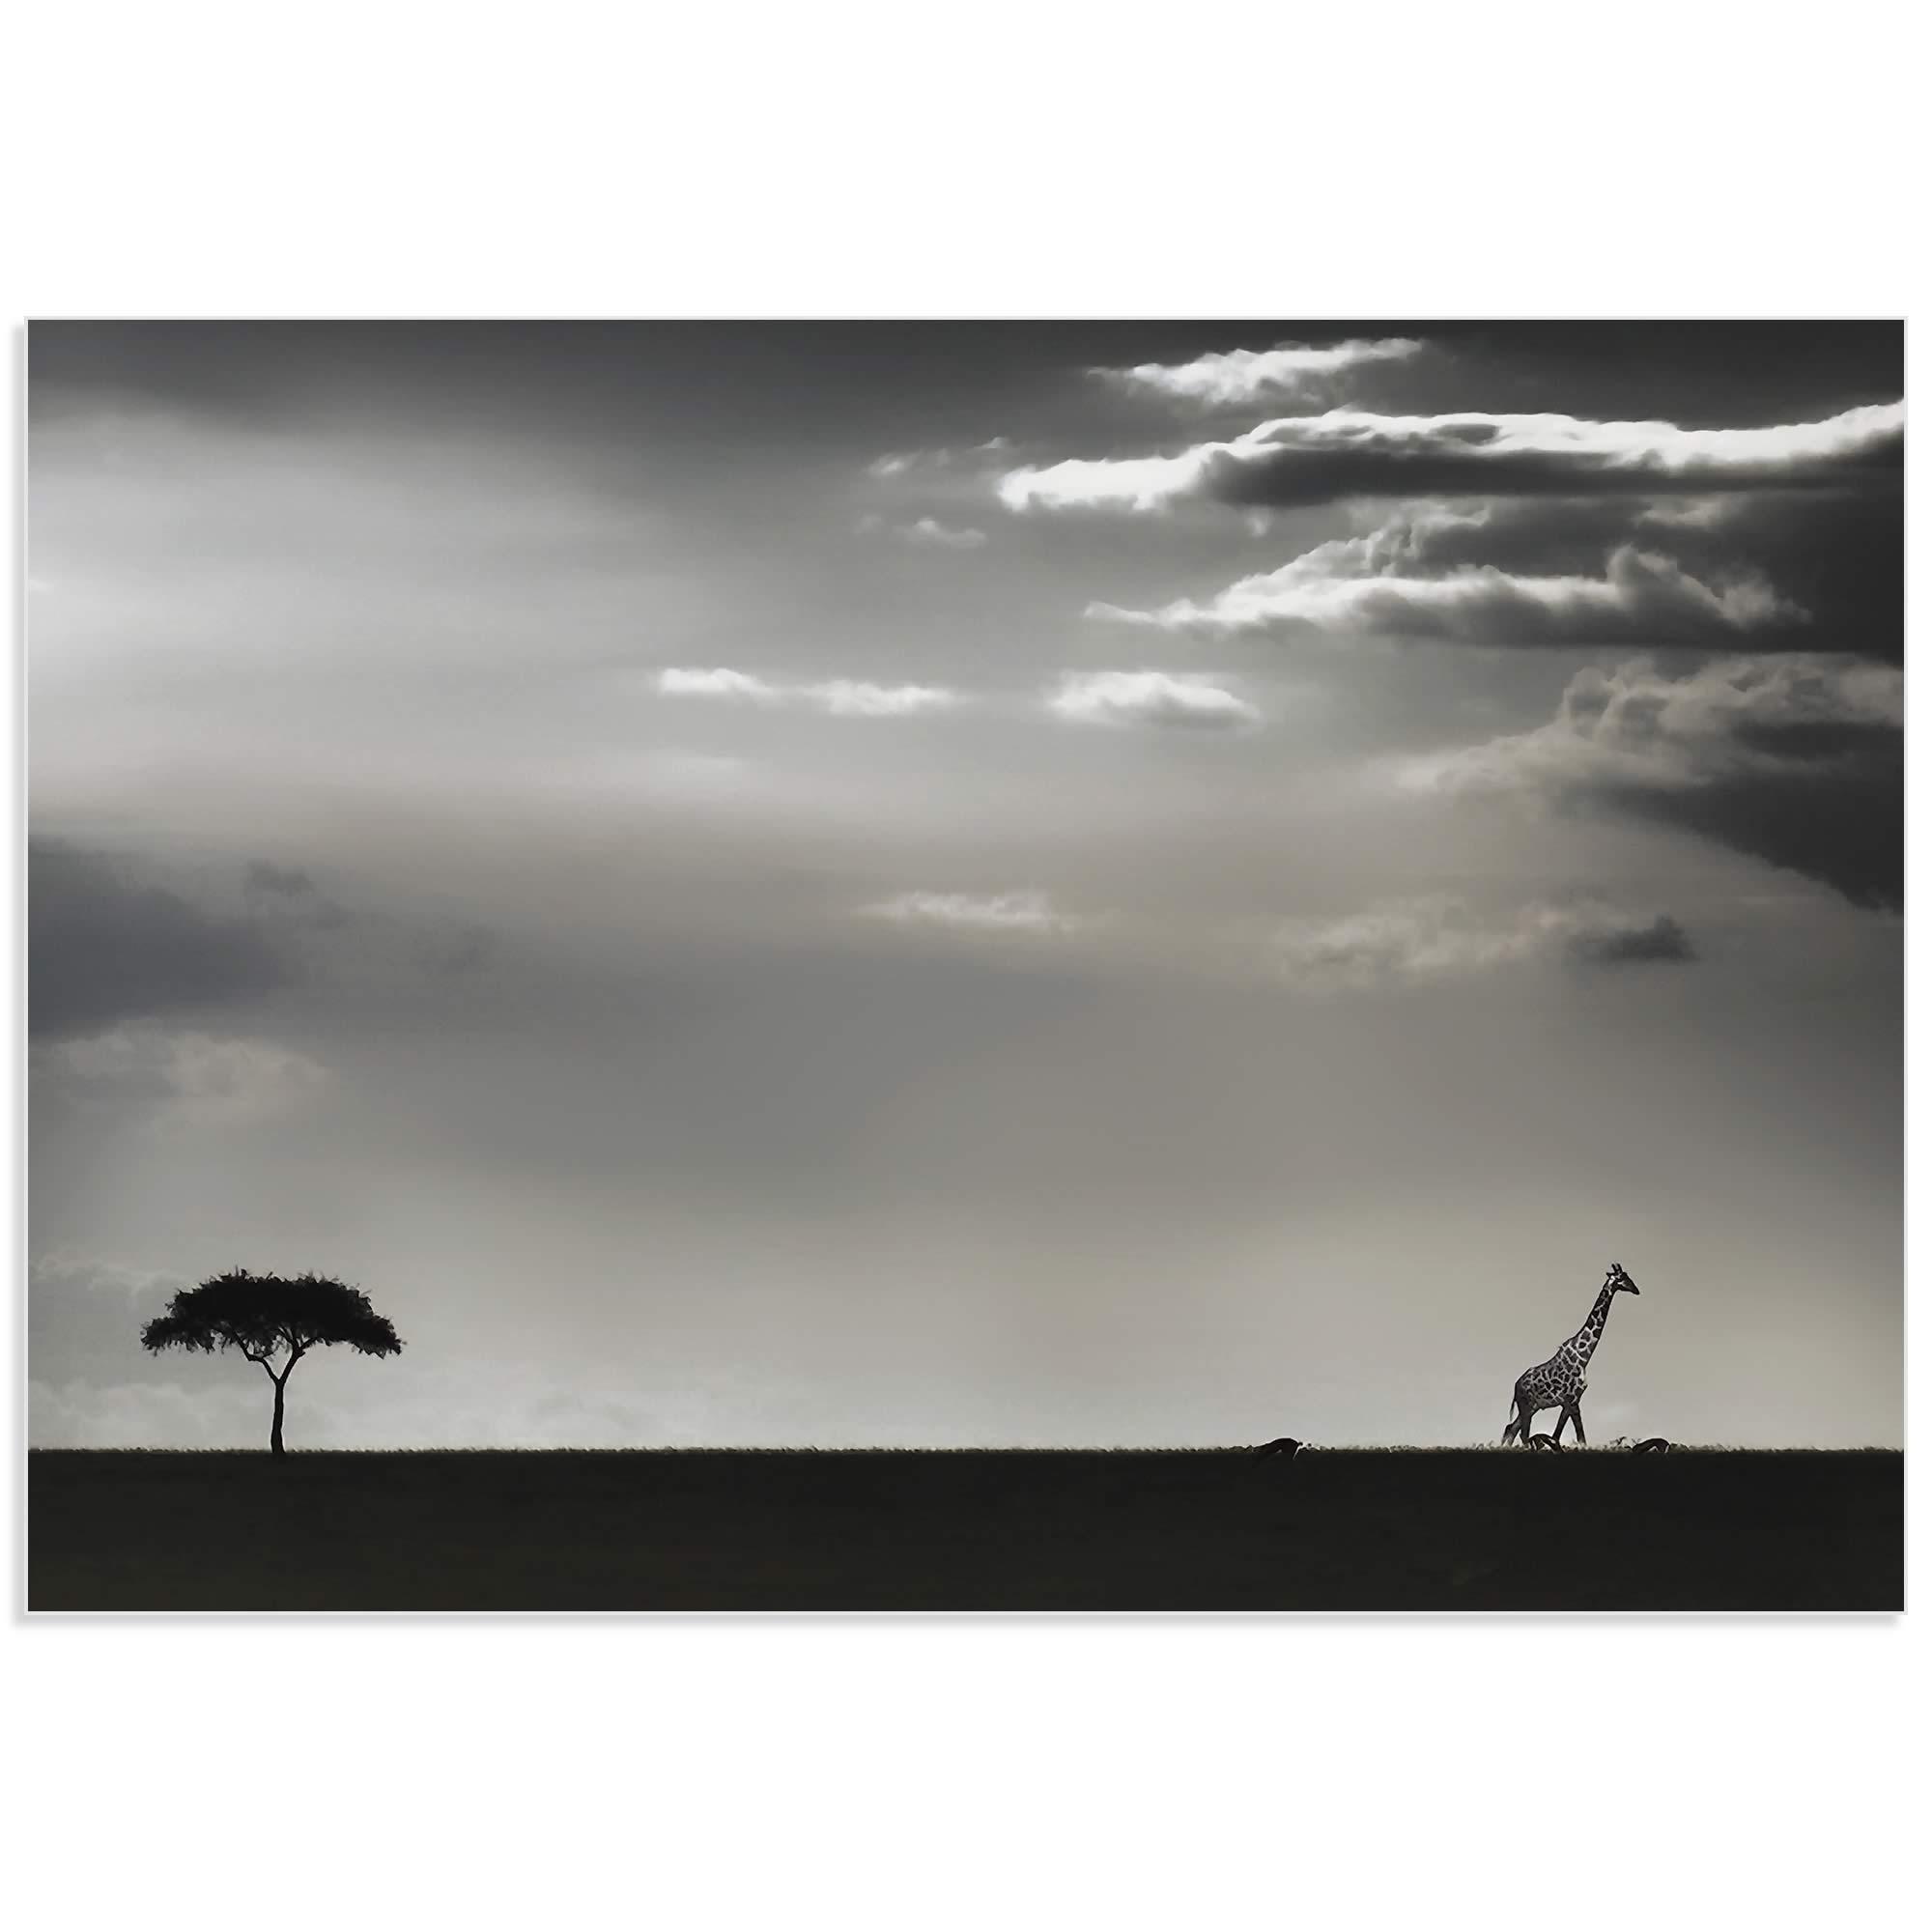 Giraffe on the Horizon by Piet Flour - Giraffe Wall Art on Metal or Acrylic - Alternate View 2